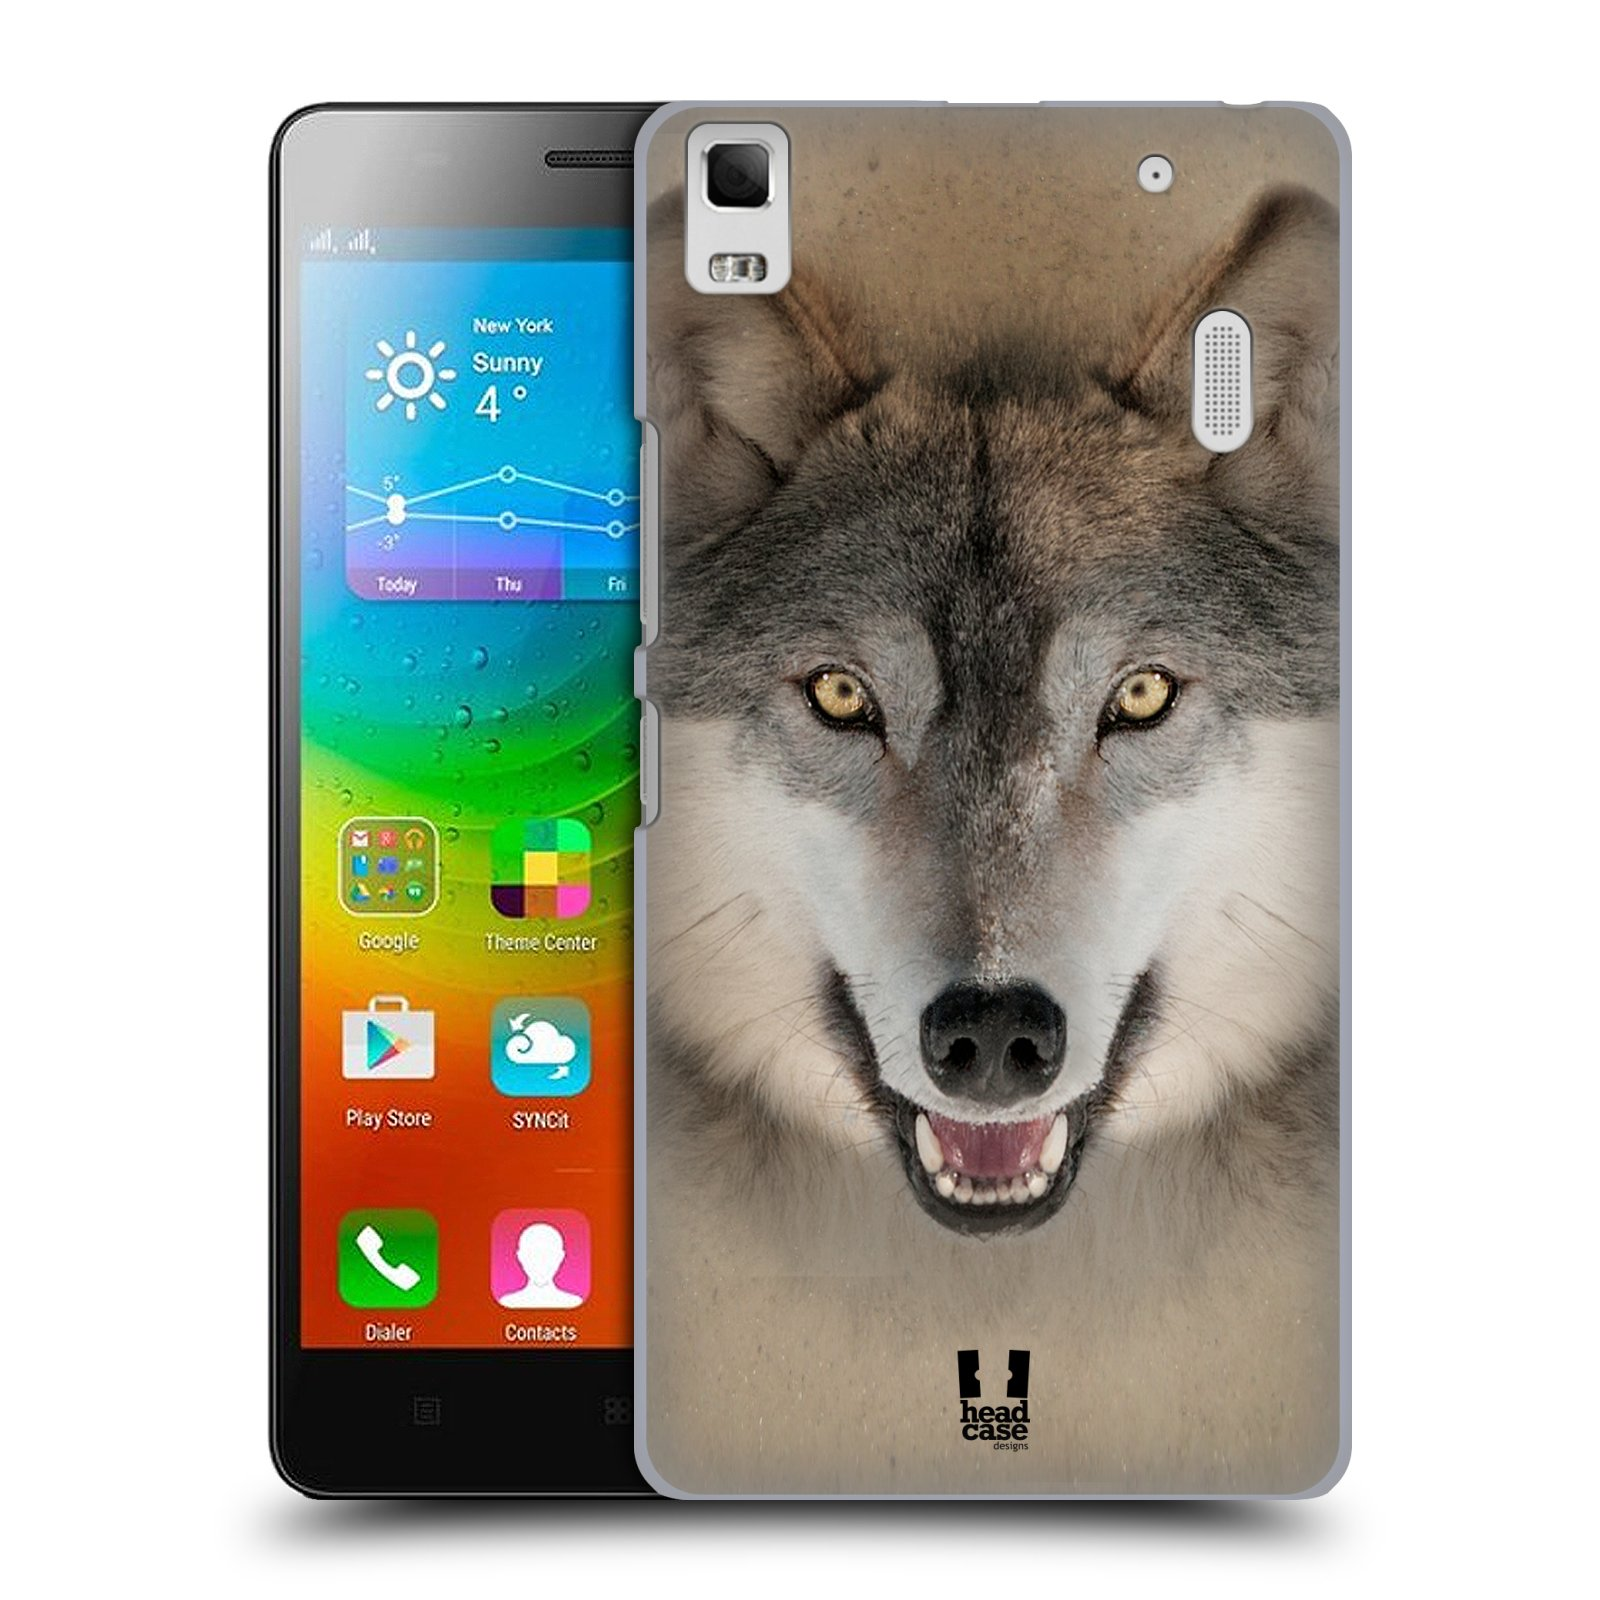 HEAD CASE pevný plastový obal na mobil LENOVO A7000 / A7000 DUAL / K3 NOTE vzor Zvířecí tváře 2 vlk šedý